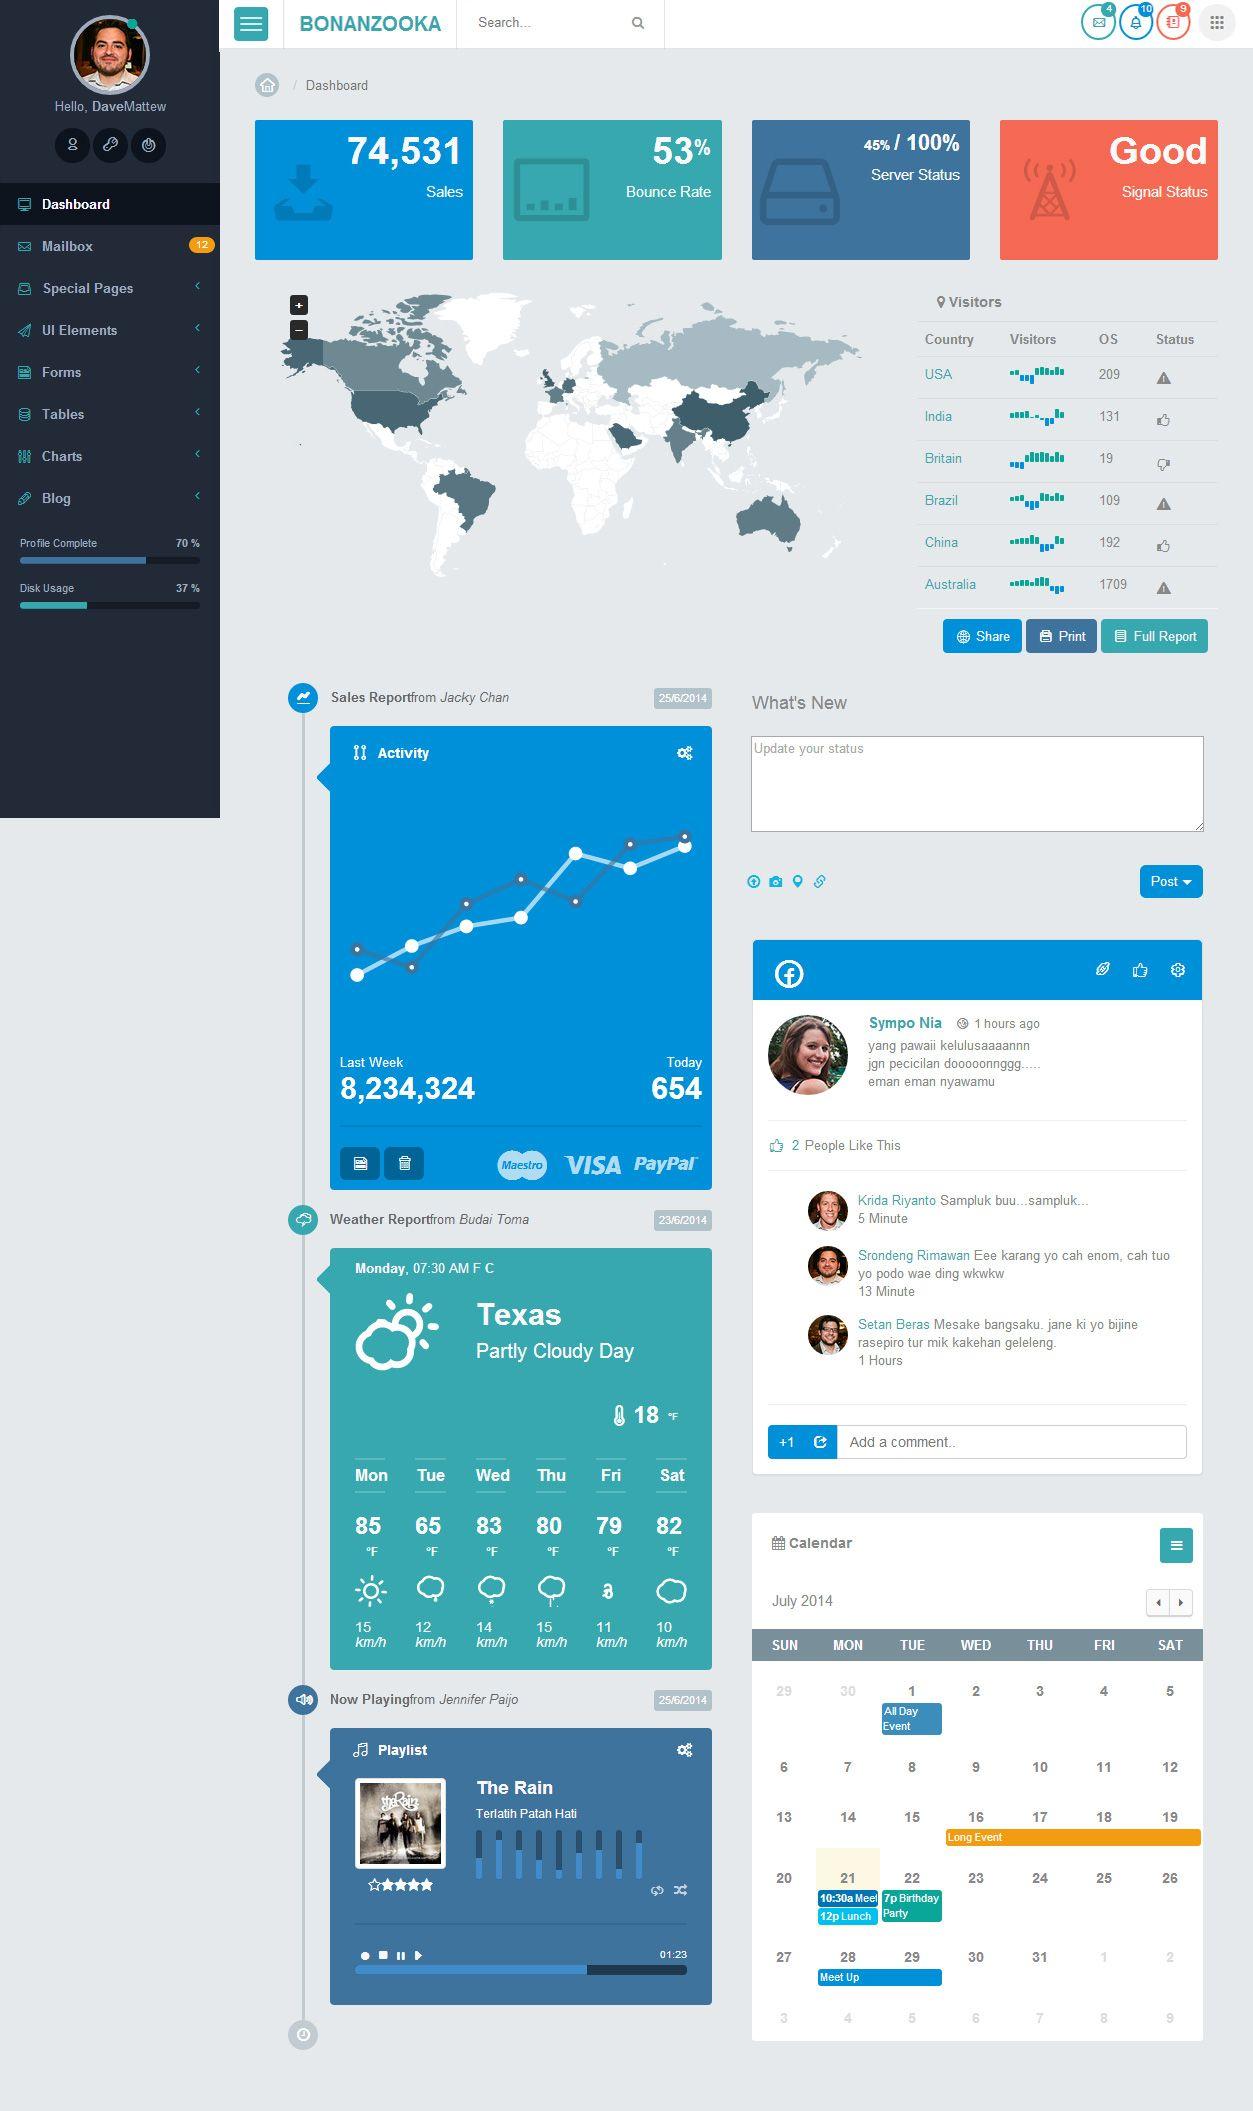 Bonanzooka is full premium responsive admin dashboard template bonanzooka is full premium responsive admin dashboard template built using bootstrap 3 angularjs flat pronofoot35fo Image collections